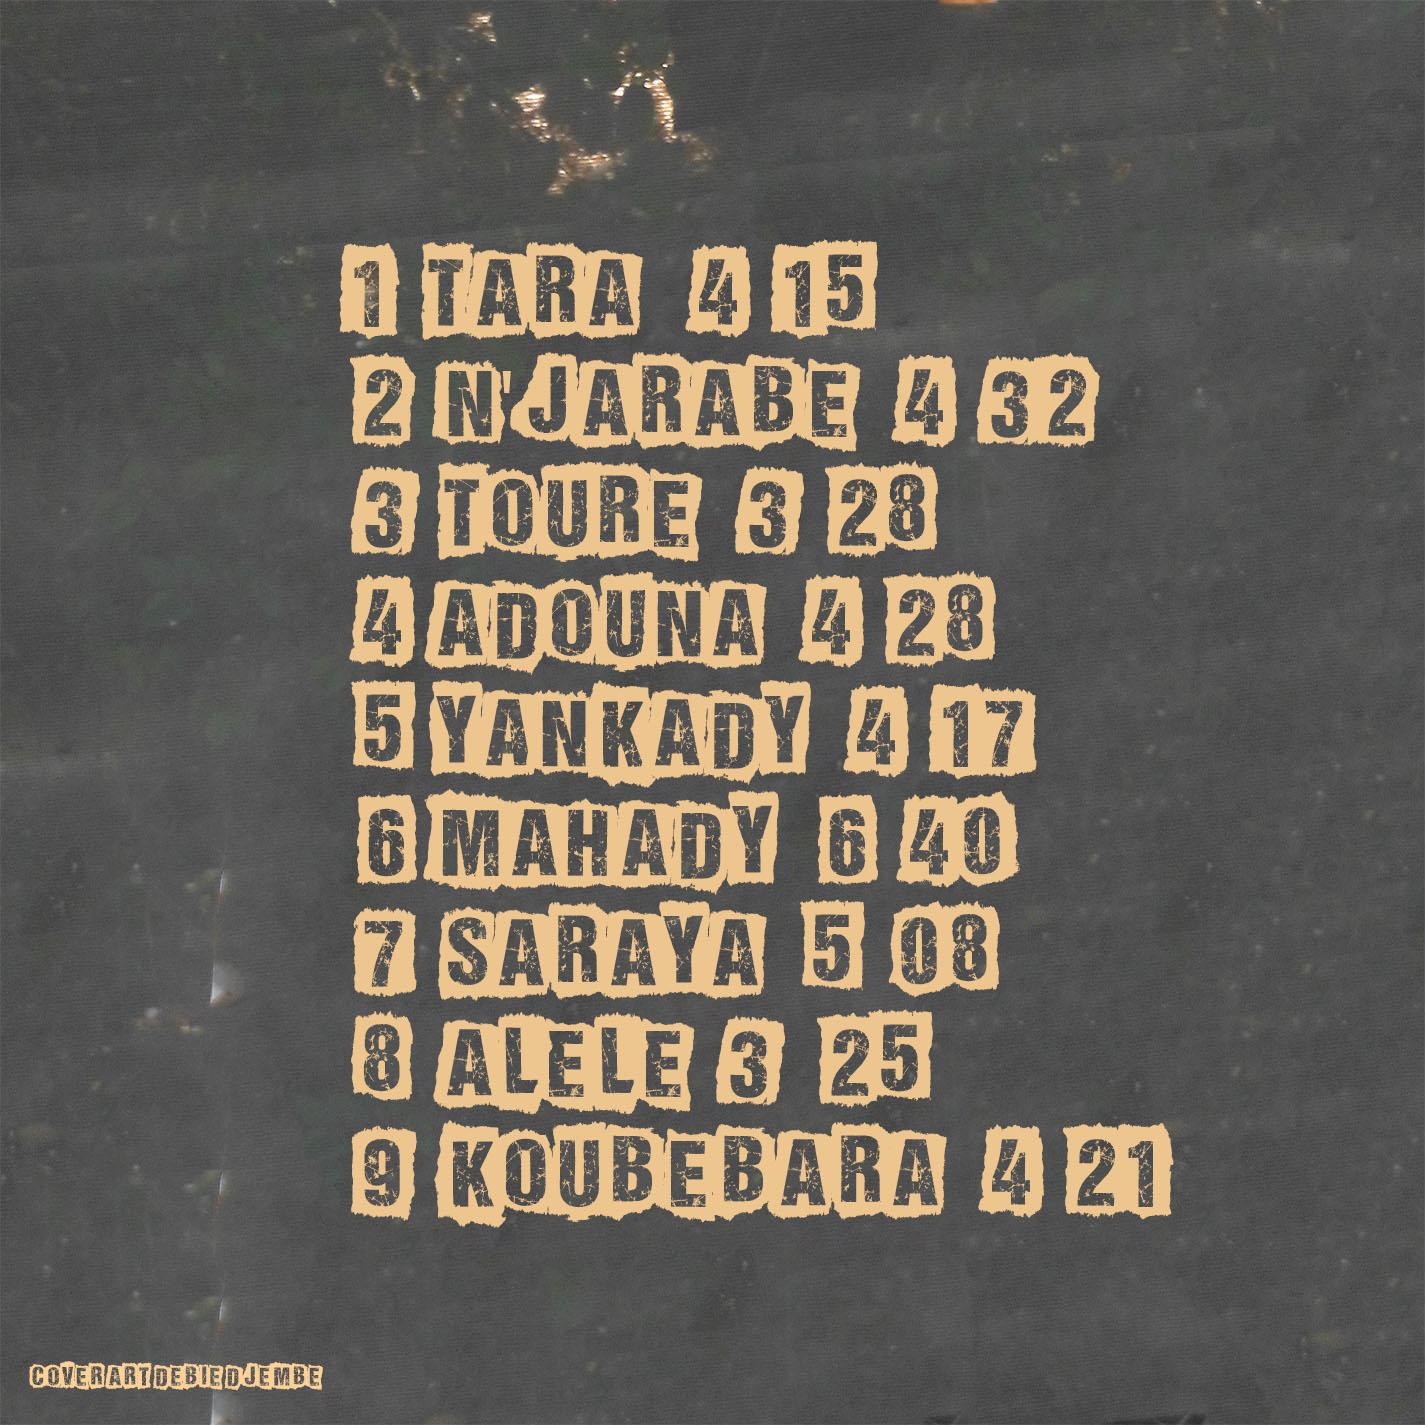 Adouna CD back inside cover Lansana Camara